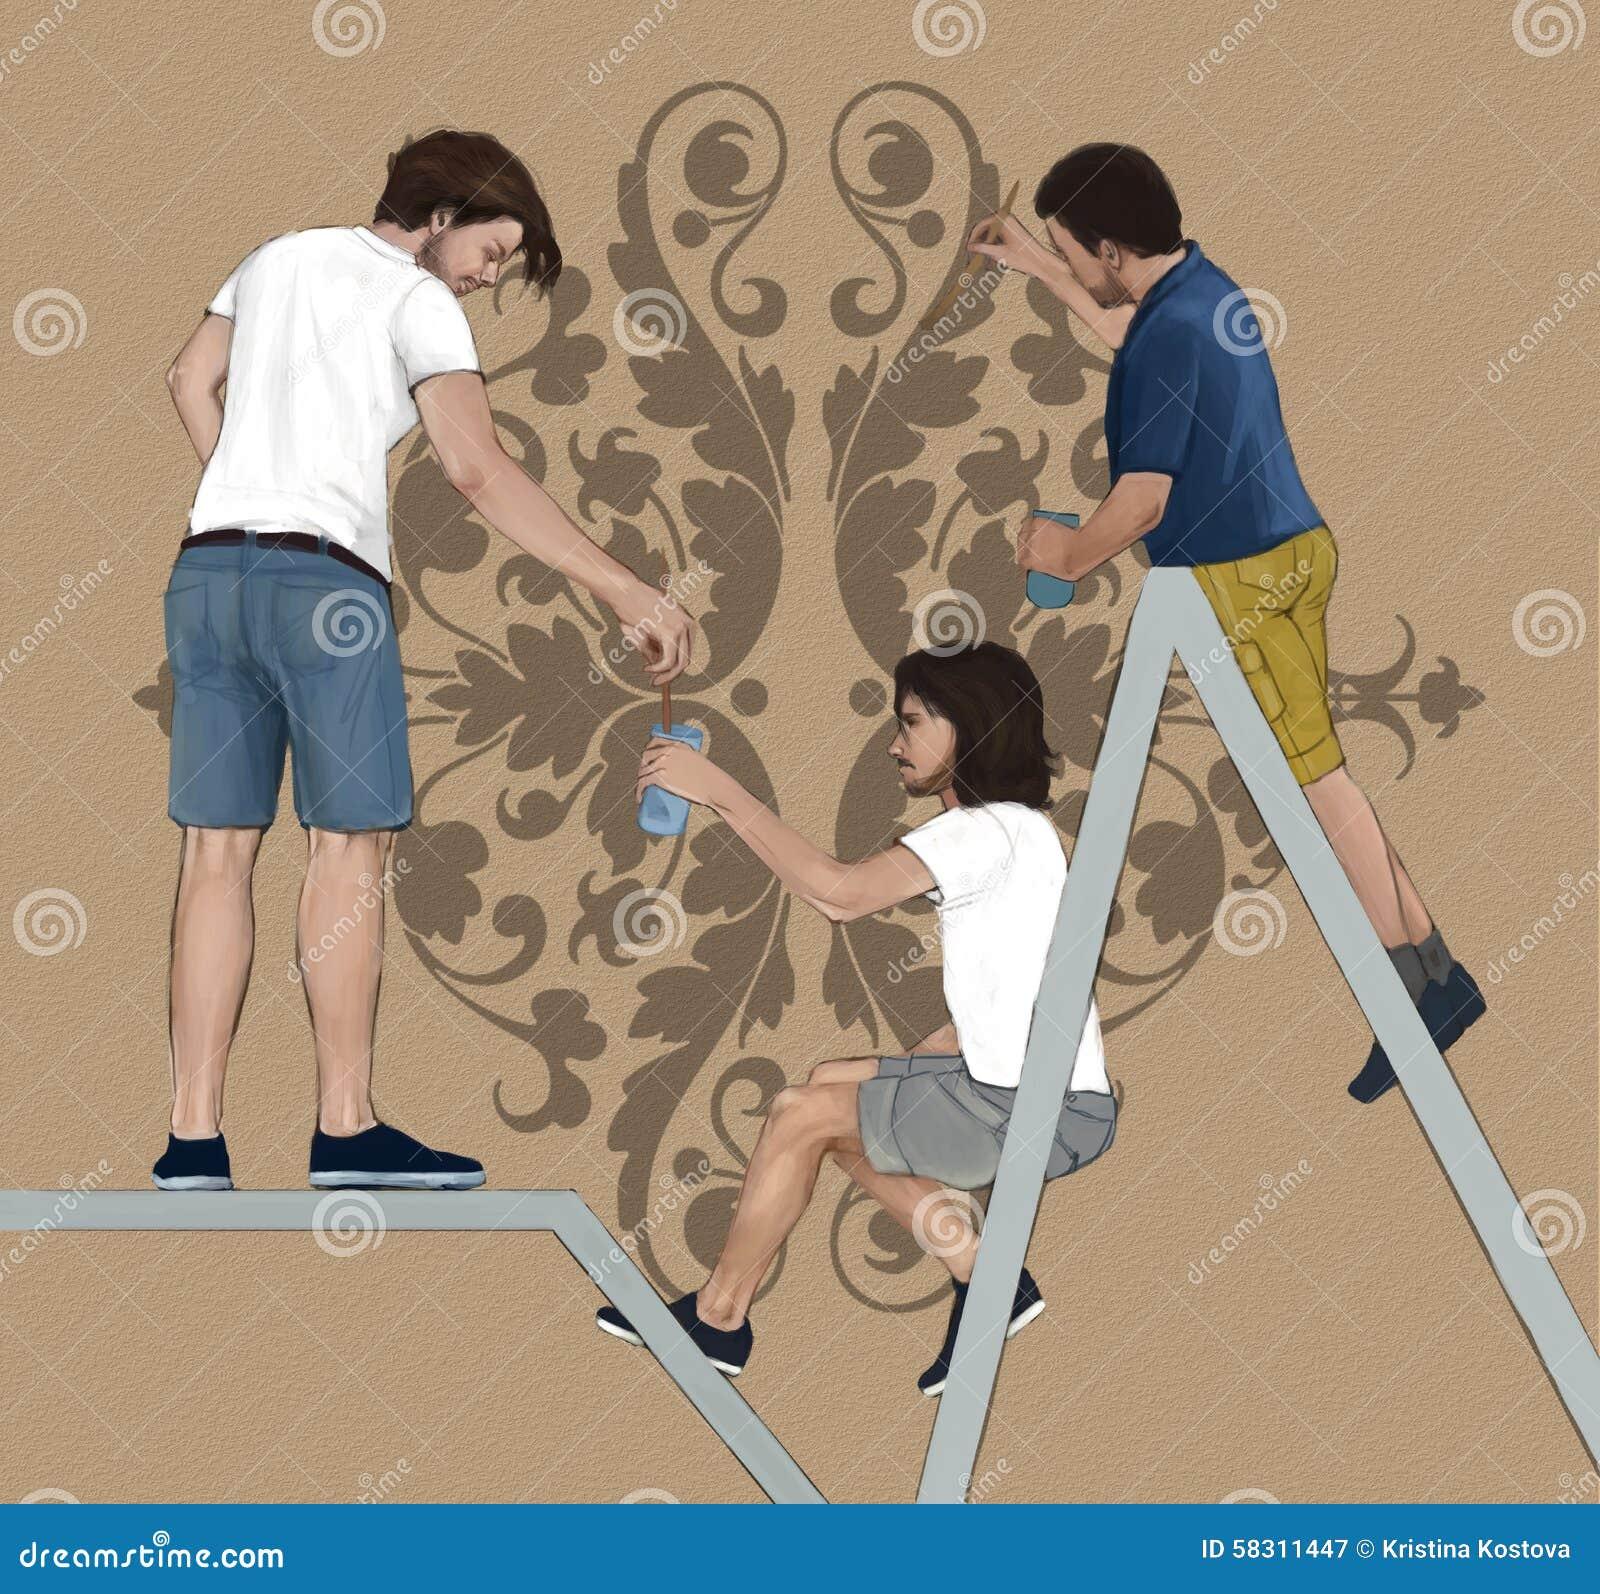 Decorators cartoons illustrations vector stock images for Professional decorator